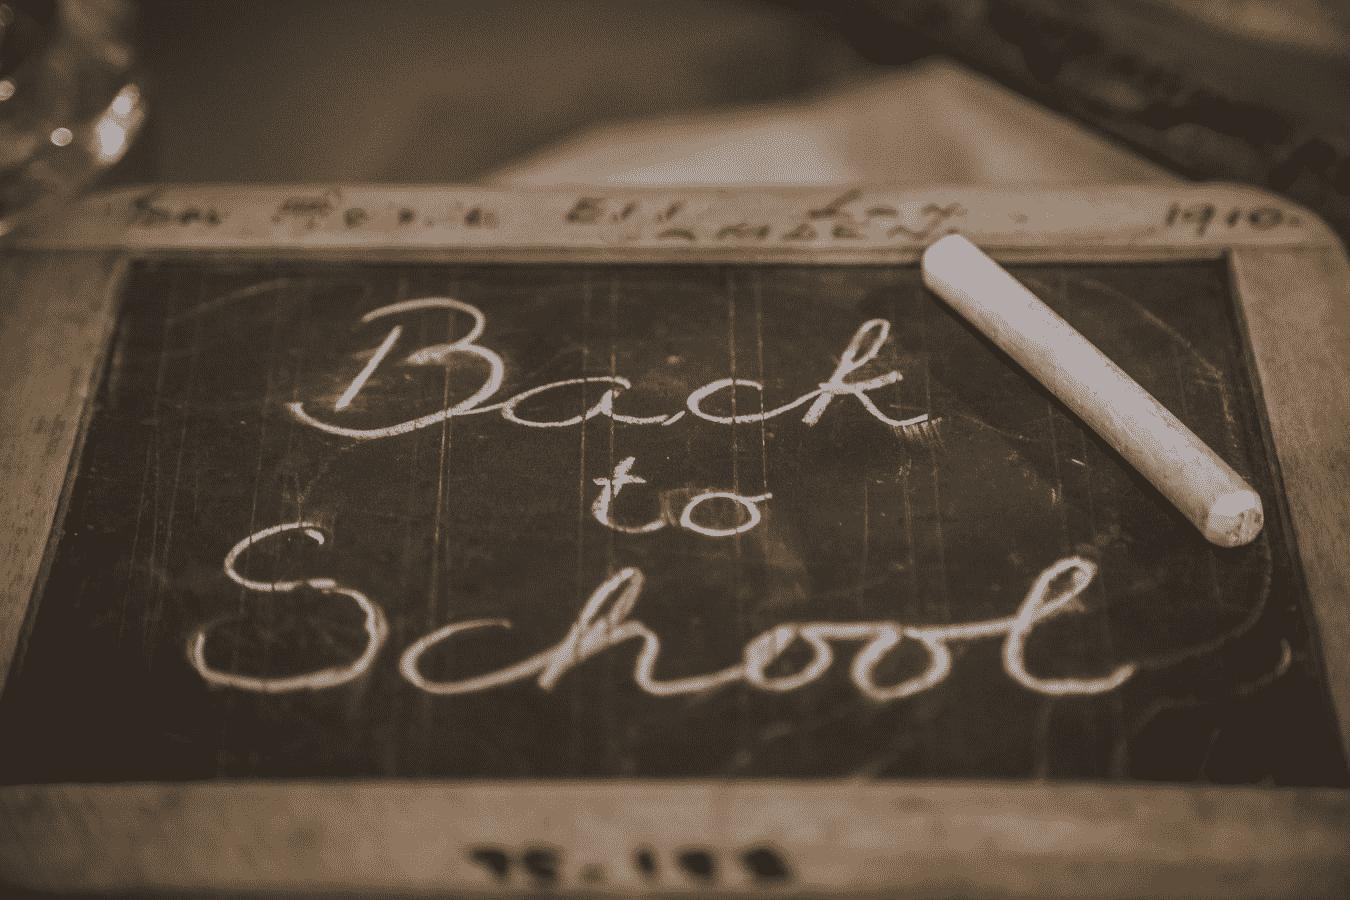 chalkboard with Back to school writings